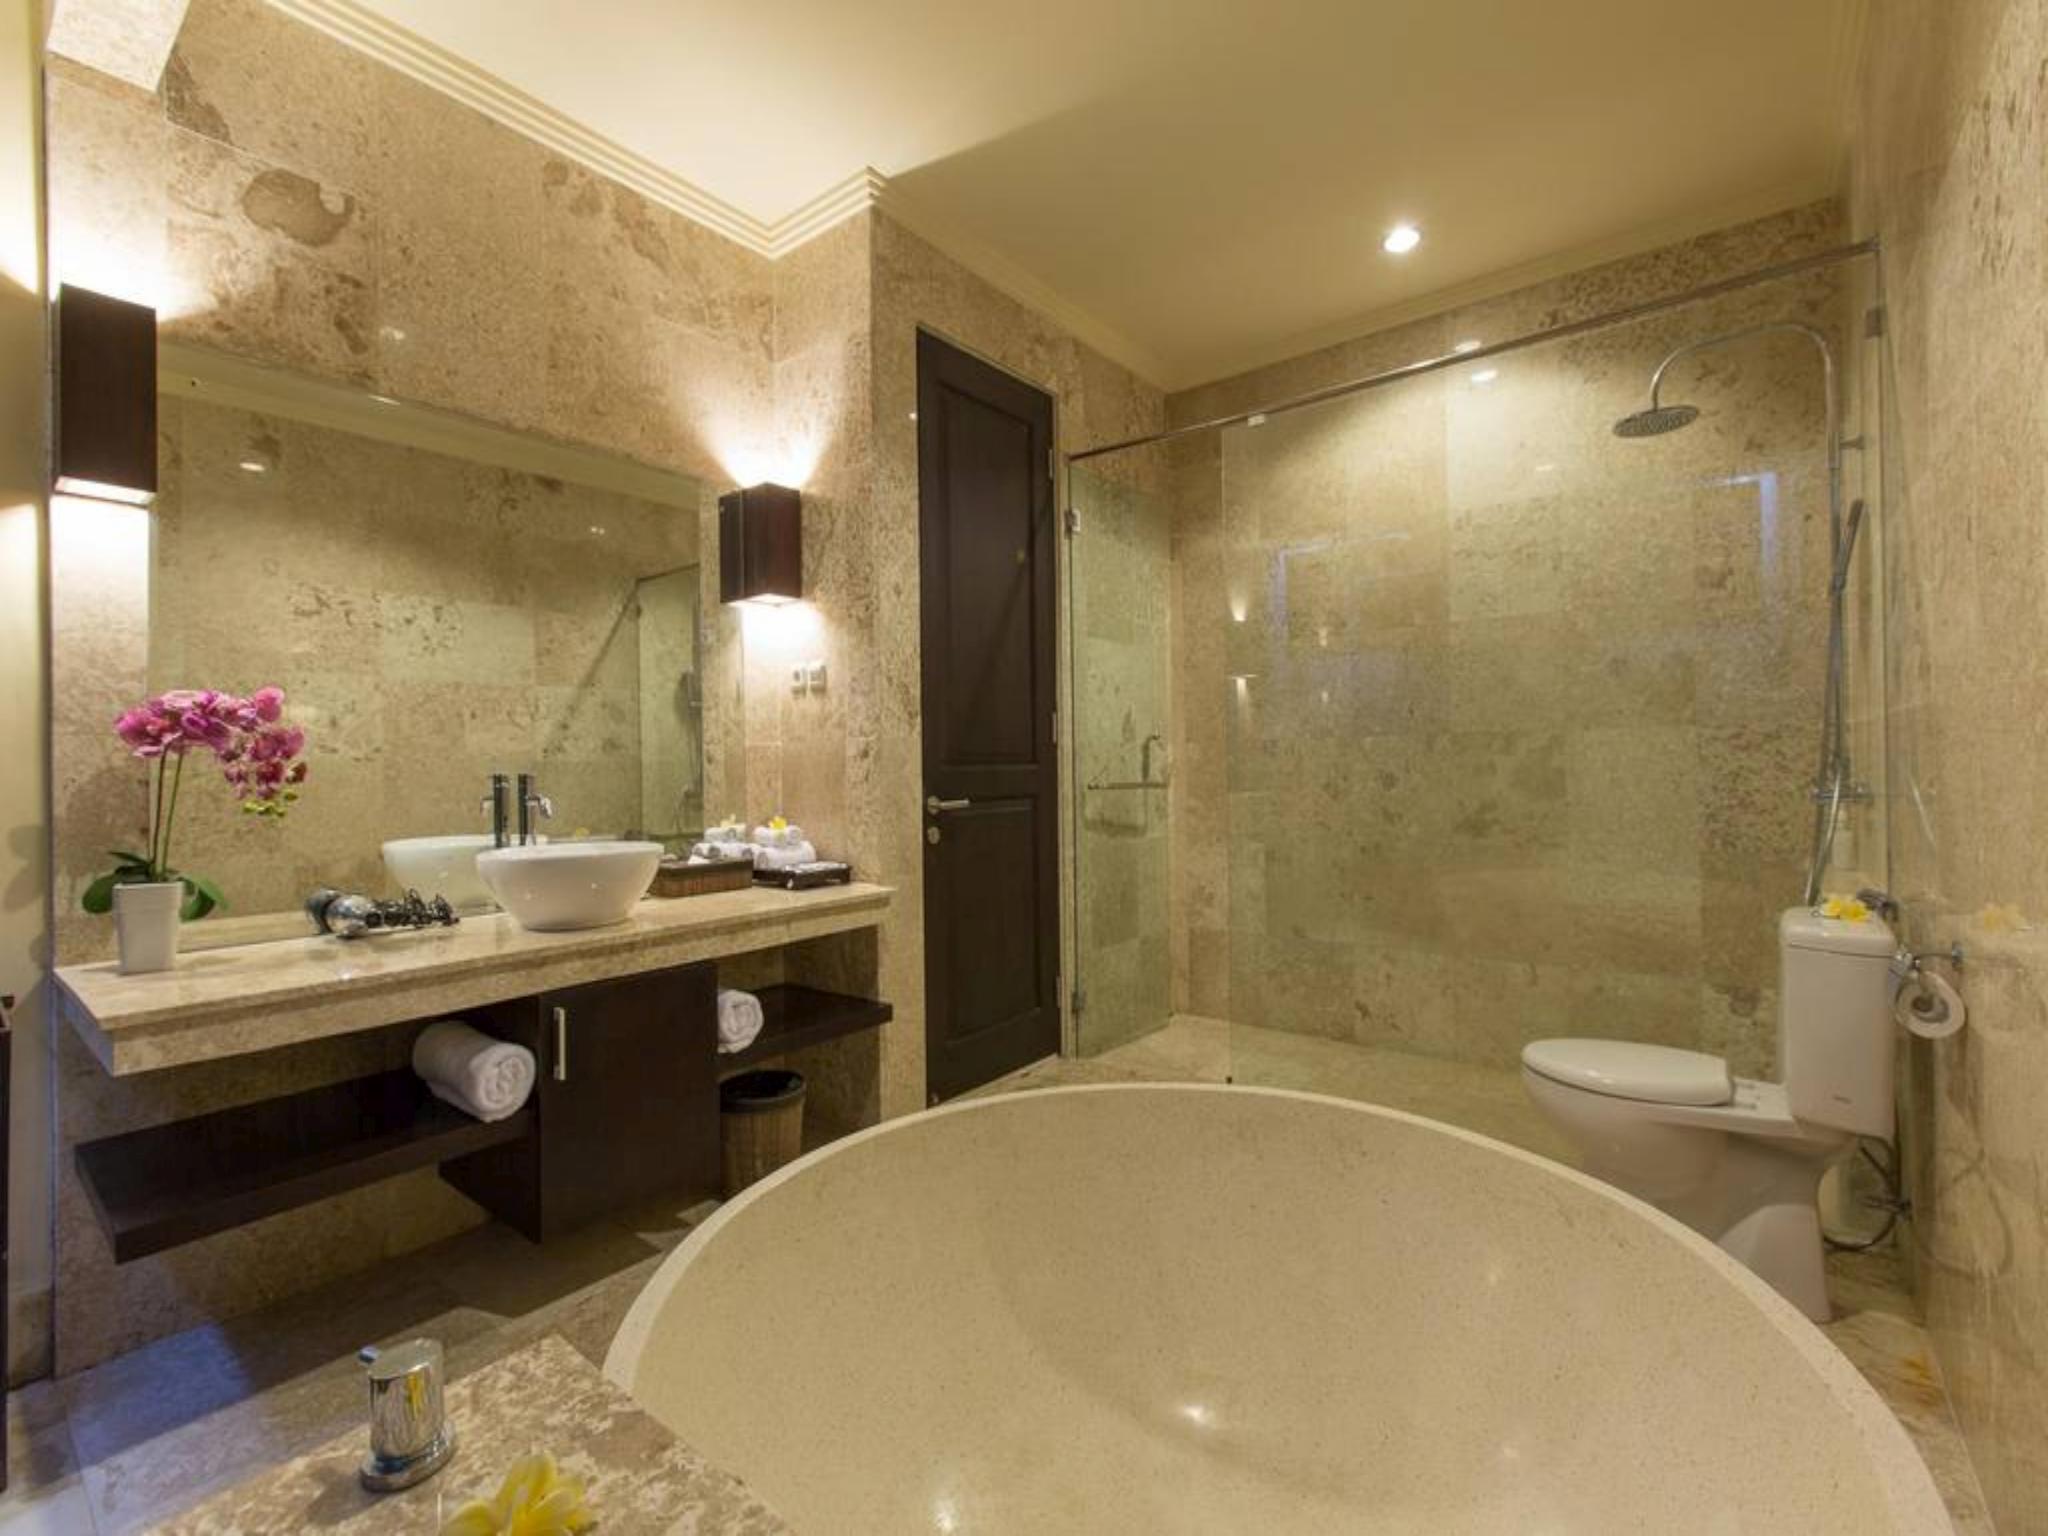 2 Bedroom Villas Saraya at Jimbaran -- Brand New